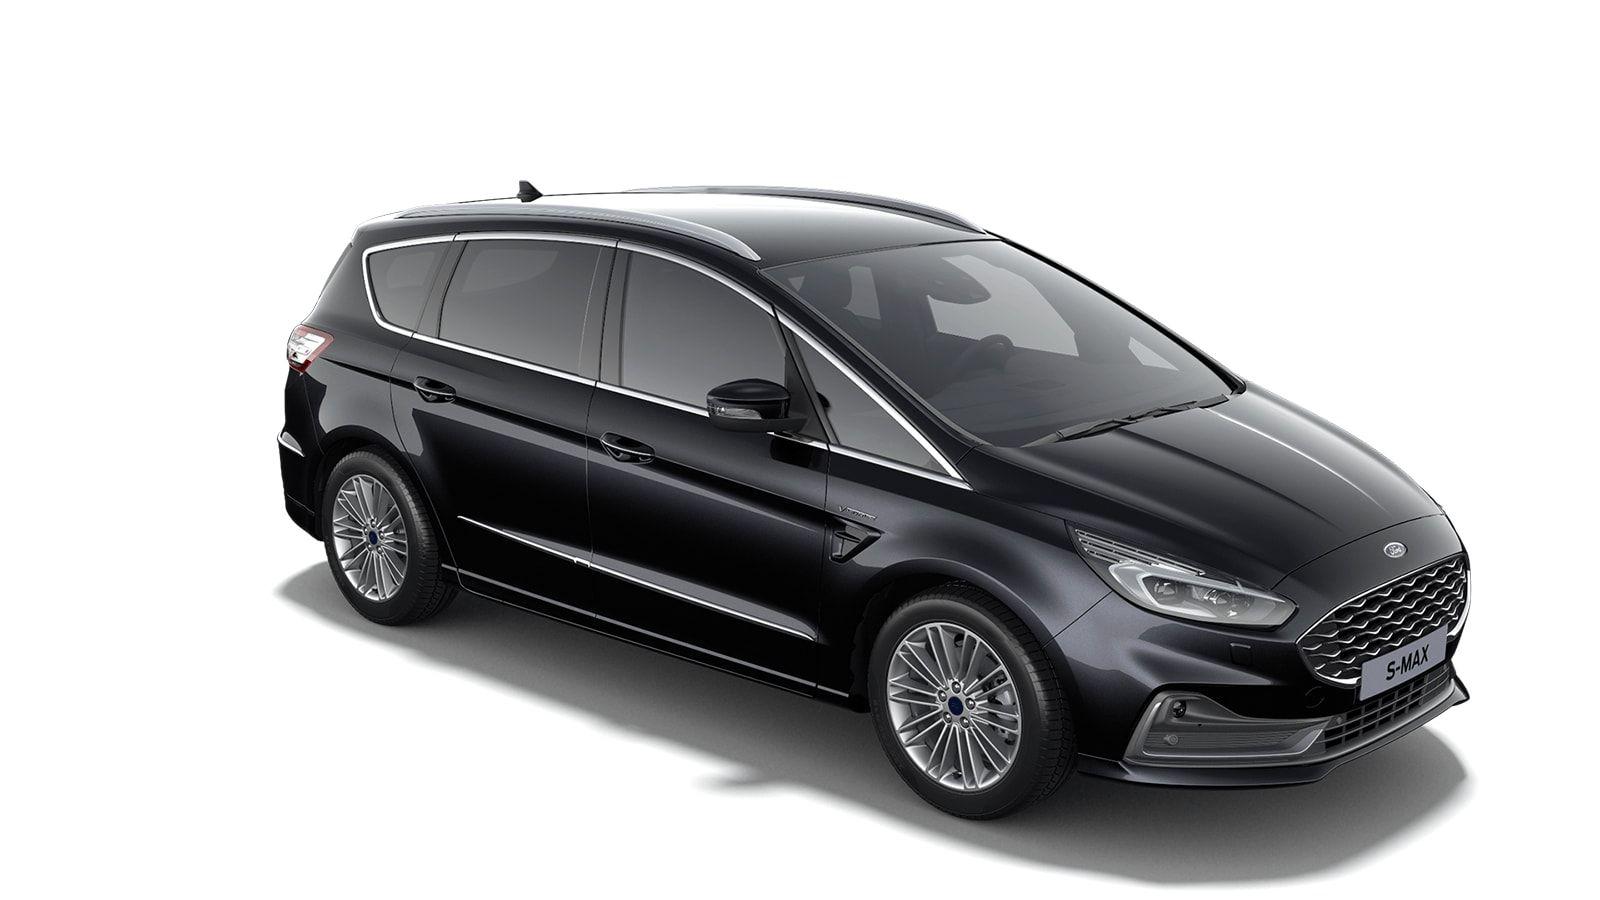 "Nieuw Ford S-max Vignale 2.0 TDCi 190pk / 139kW Auto-Start-Stop A8 - 5d 9I6 - ""Agate Black Vignale"" metaalkleur 4"